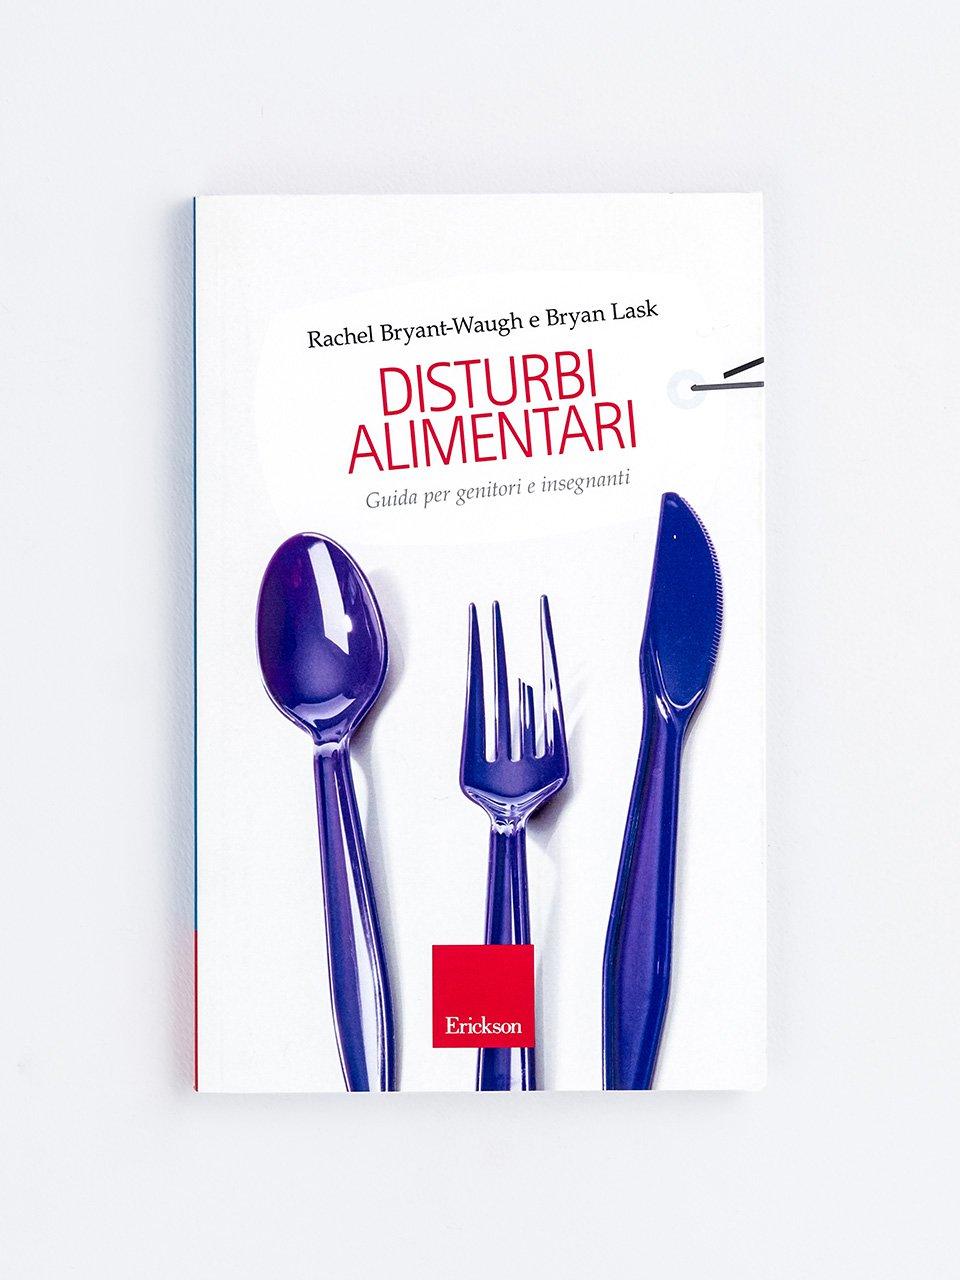 Disturbi alimentari - Tutti a tavola... - Libri - Erickson